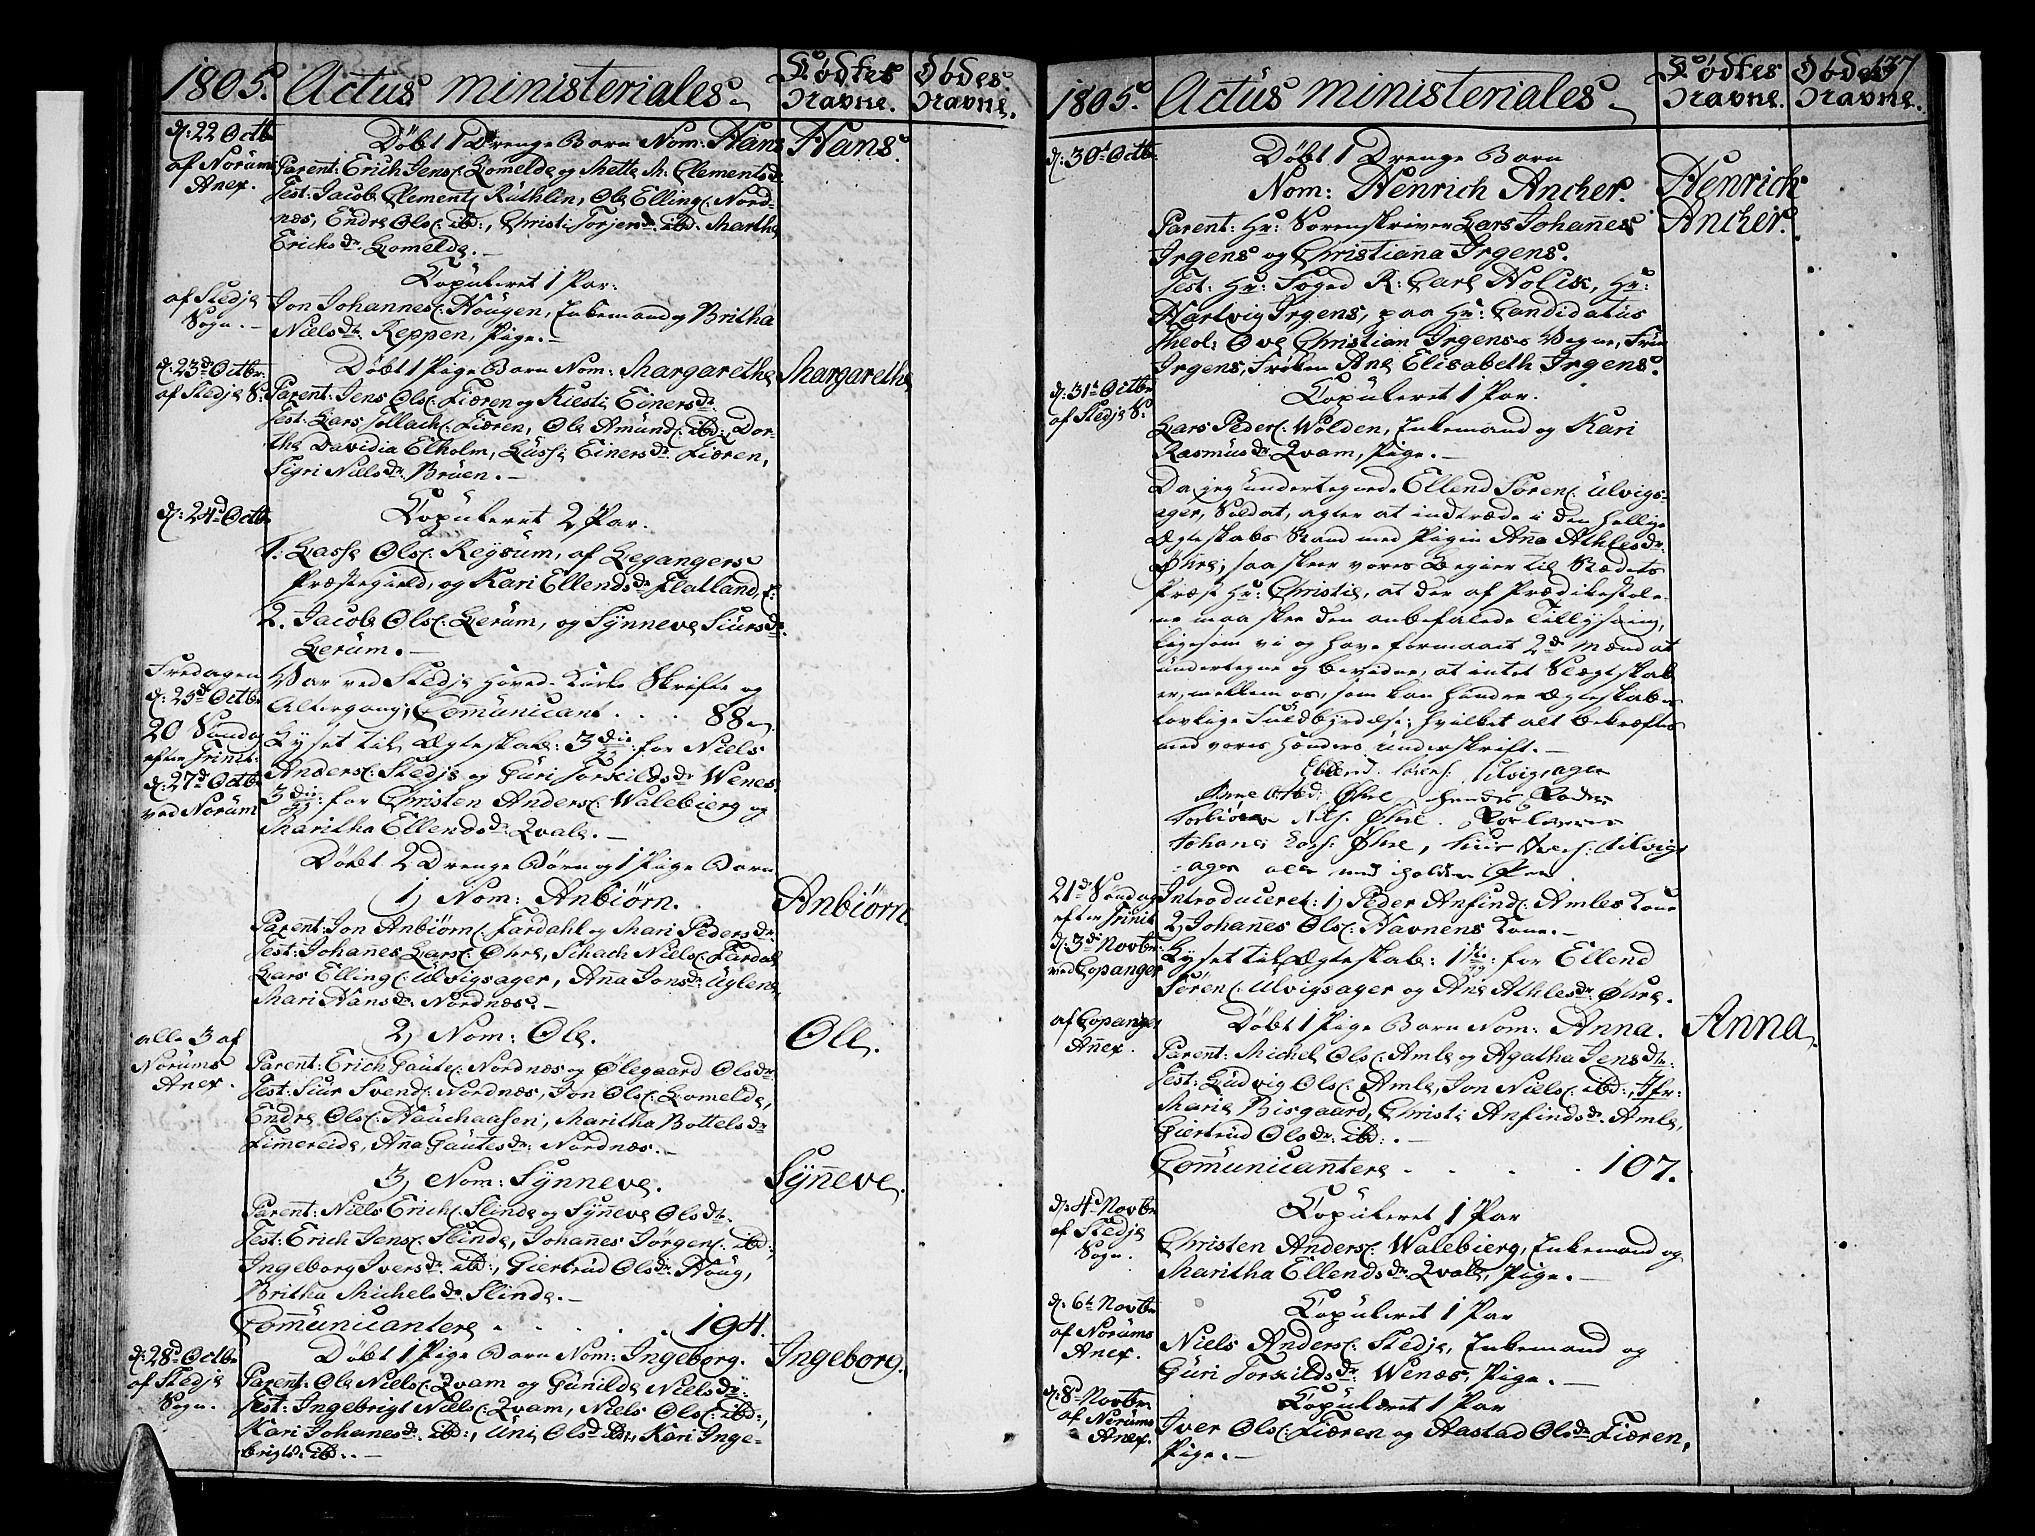 SAB, Sogndal sokneprestembete, H/Haa/Haaa/L0008: Parish register (official) no. A 8, 1795-1809, p. 137